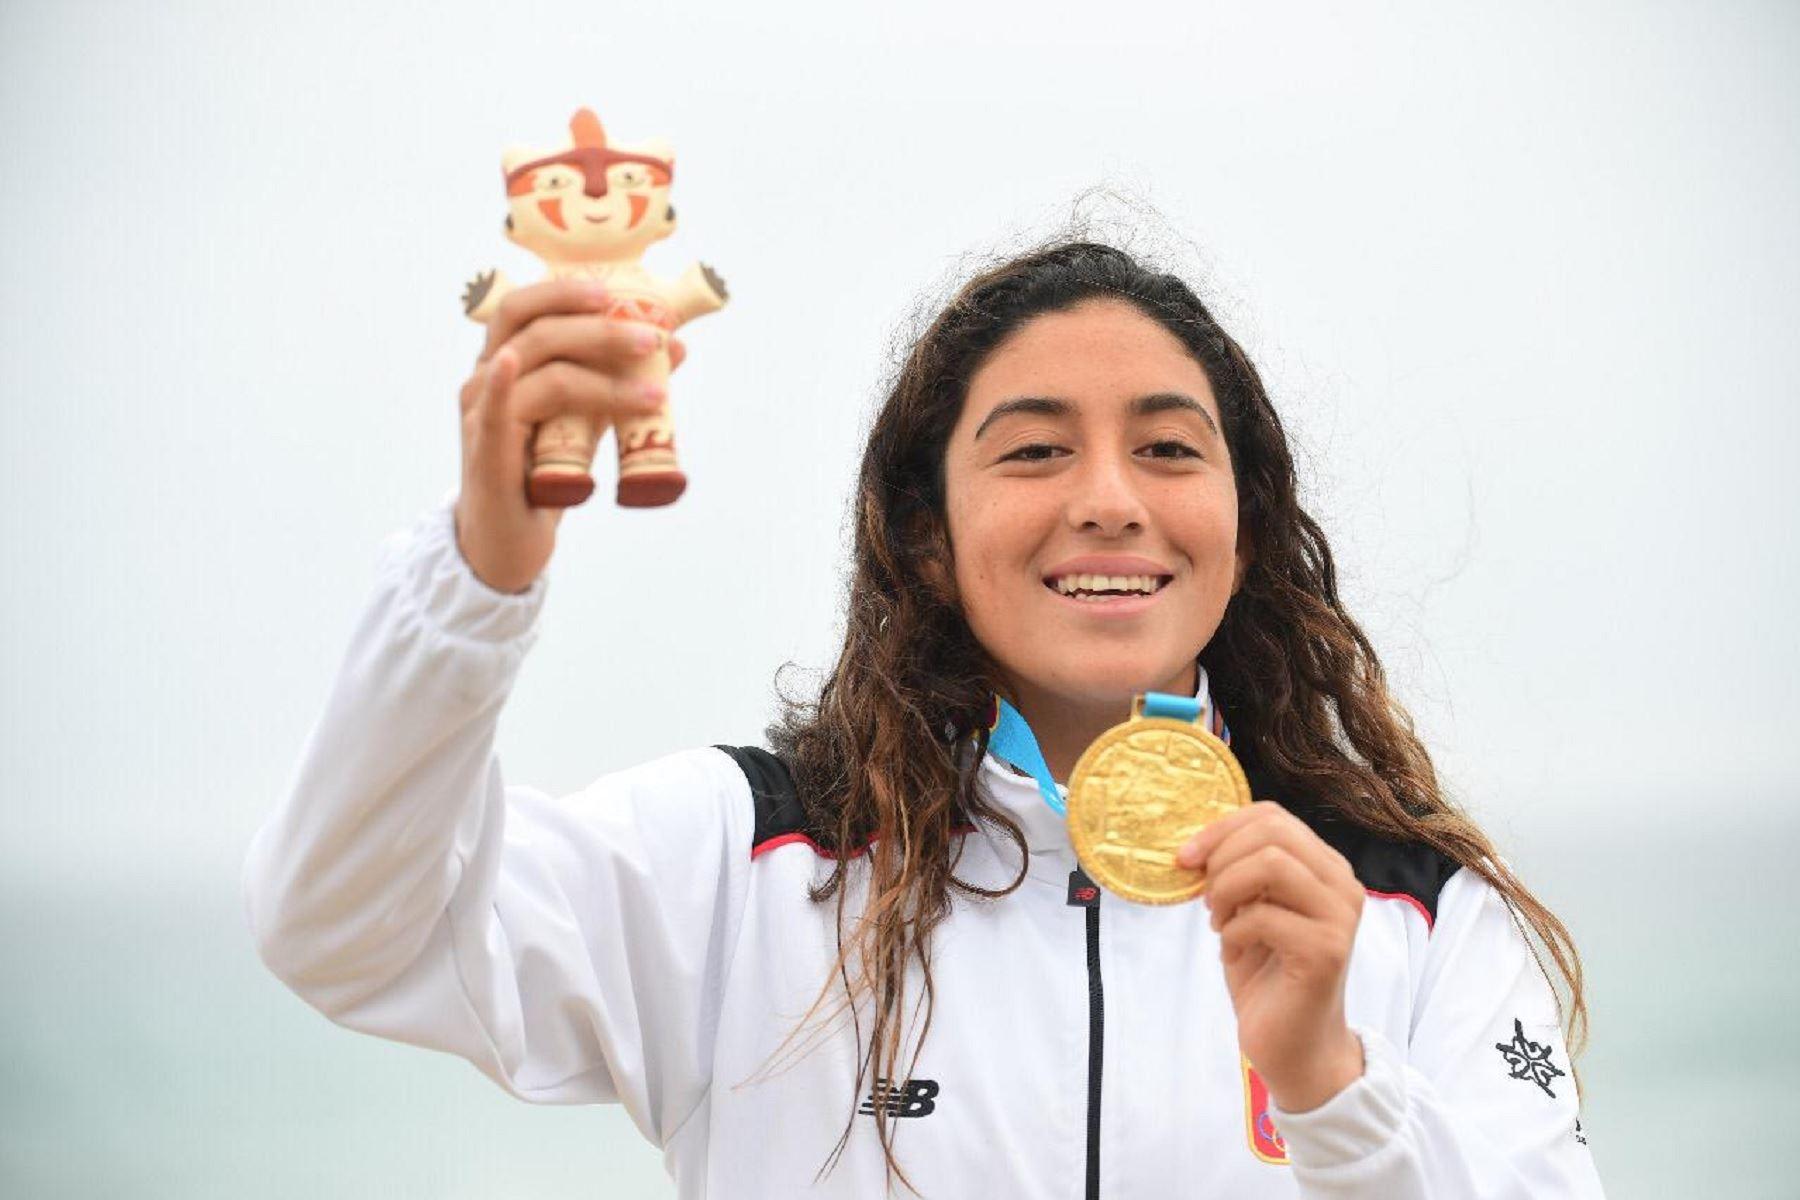 Nominan a mejor deportista de América a Tablista peruana Daniella Rosas - Radio Nacional del Perú